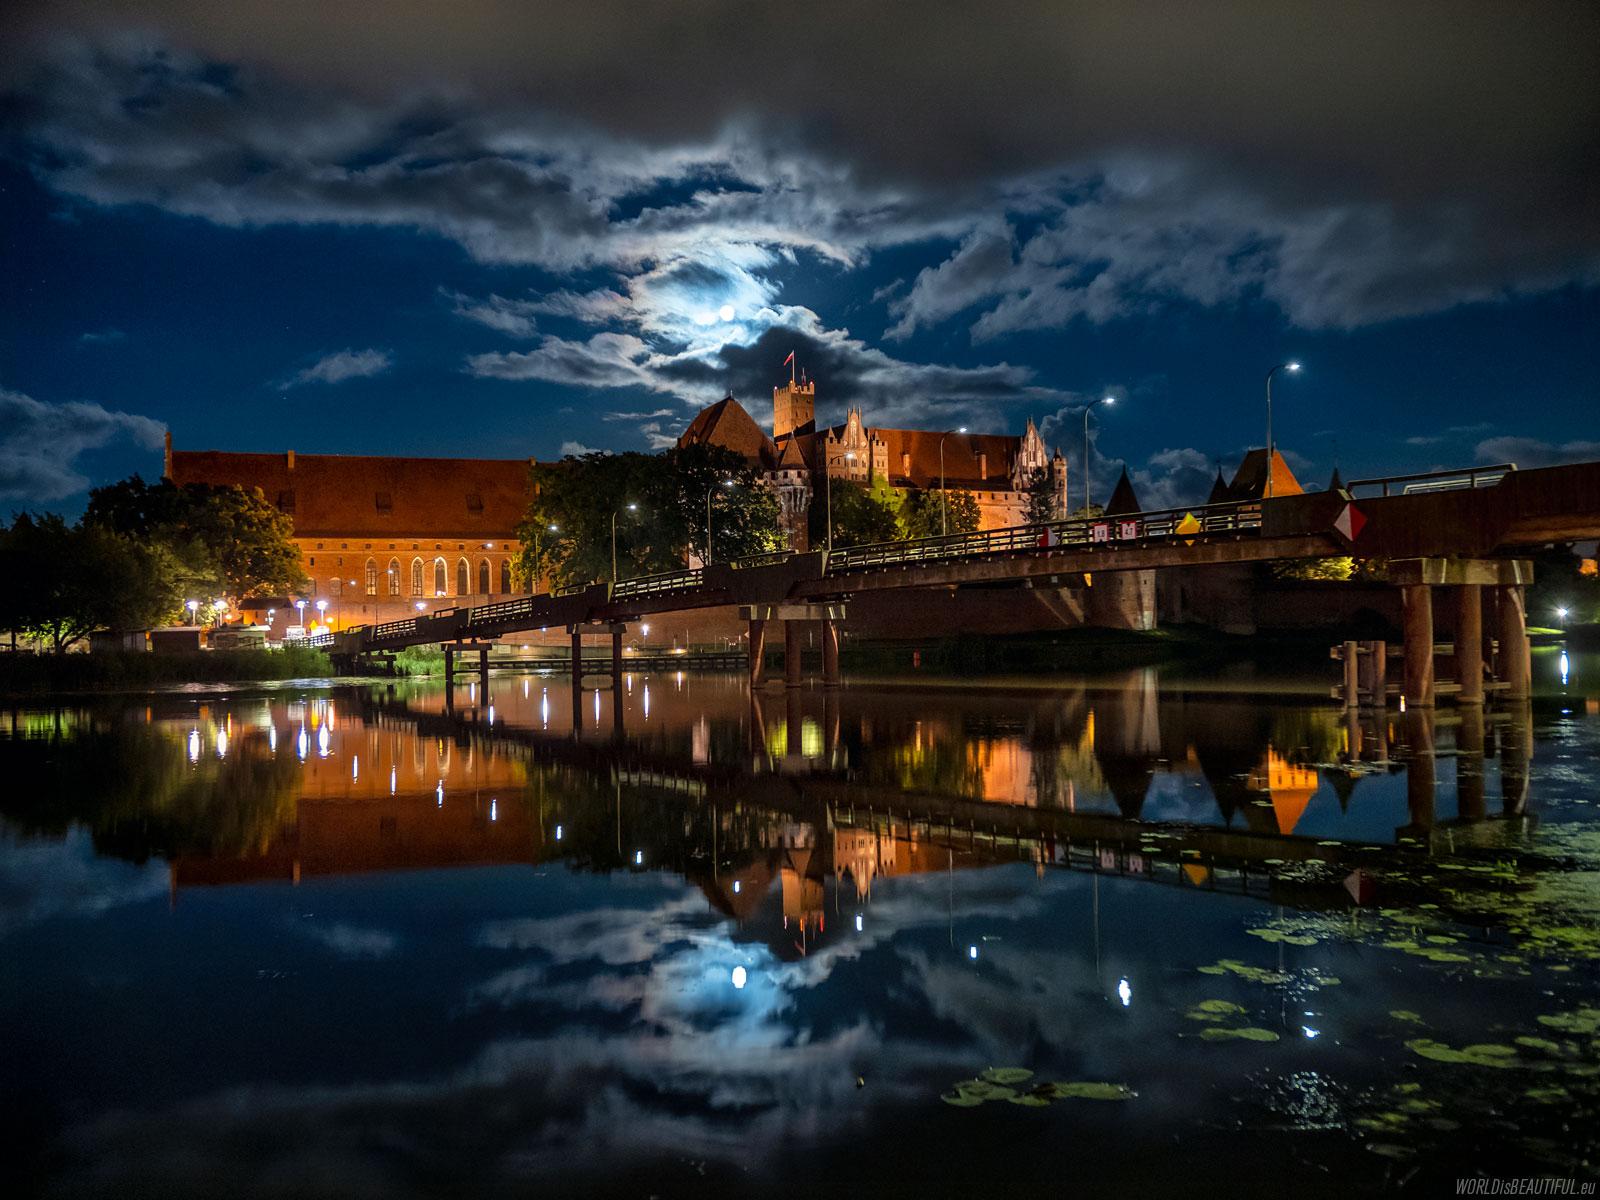 A night in Malbork